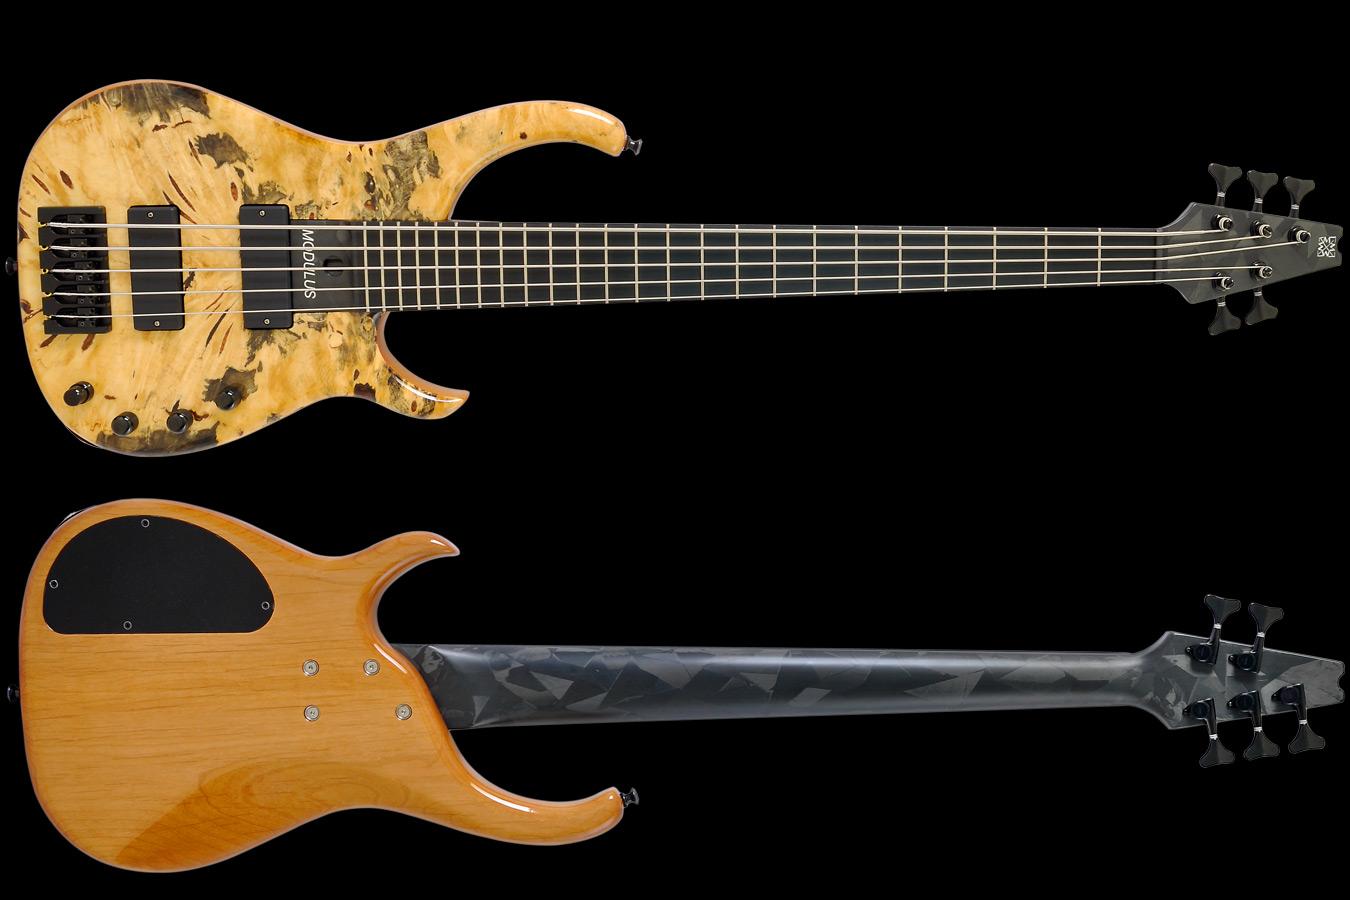 modulus bass quantum 5 buckeye high end bass guitars. Black Bedroom Furniture Sets. Home Design Ideas